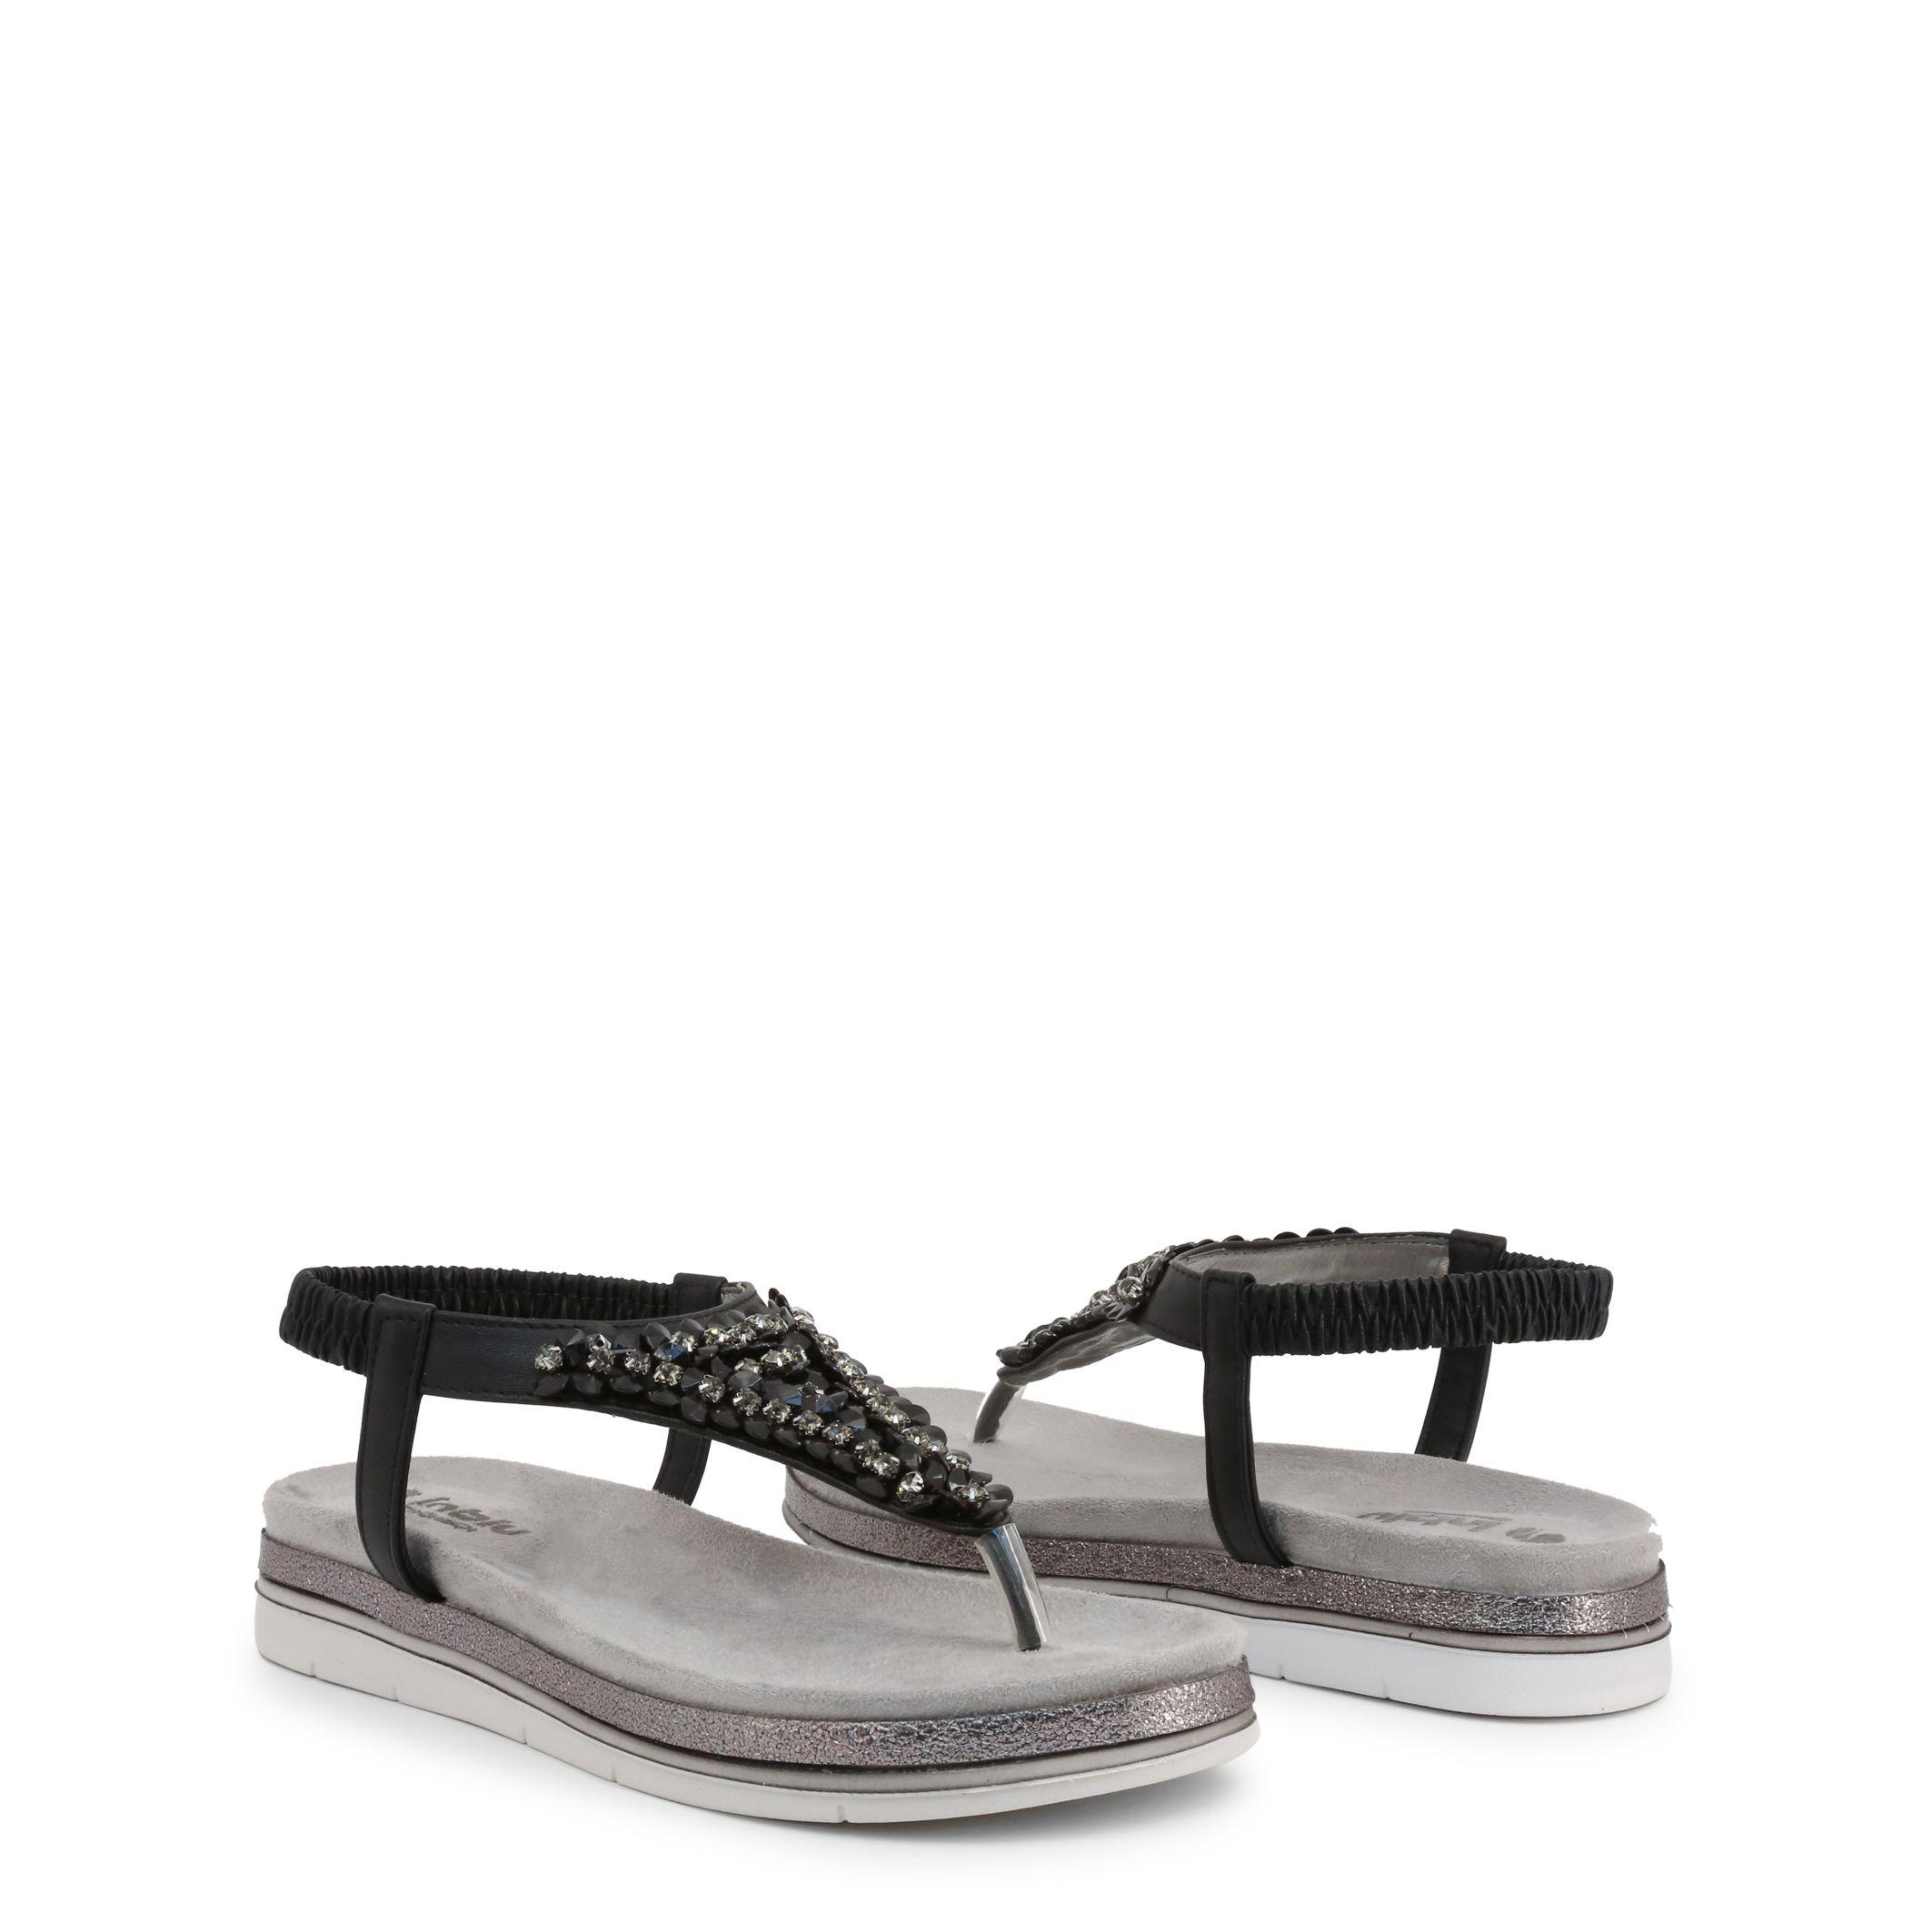 Nu-pieds et Tongs Inblu – SA000027